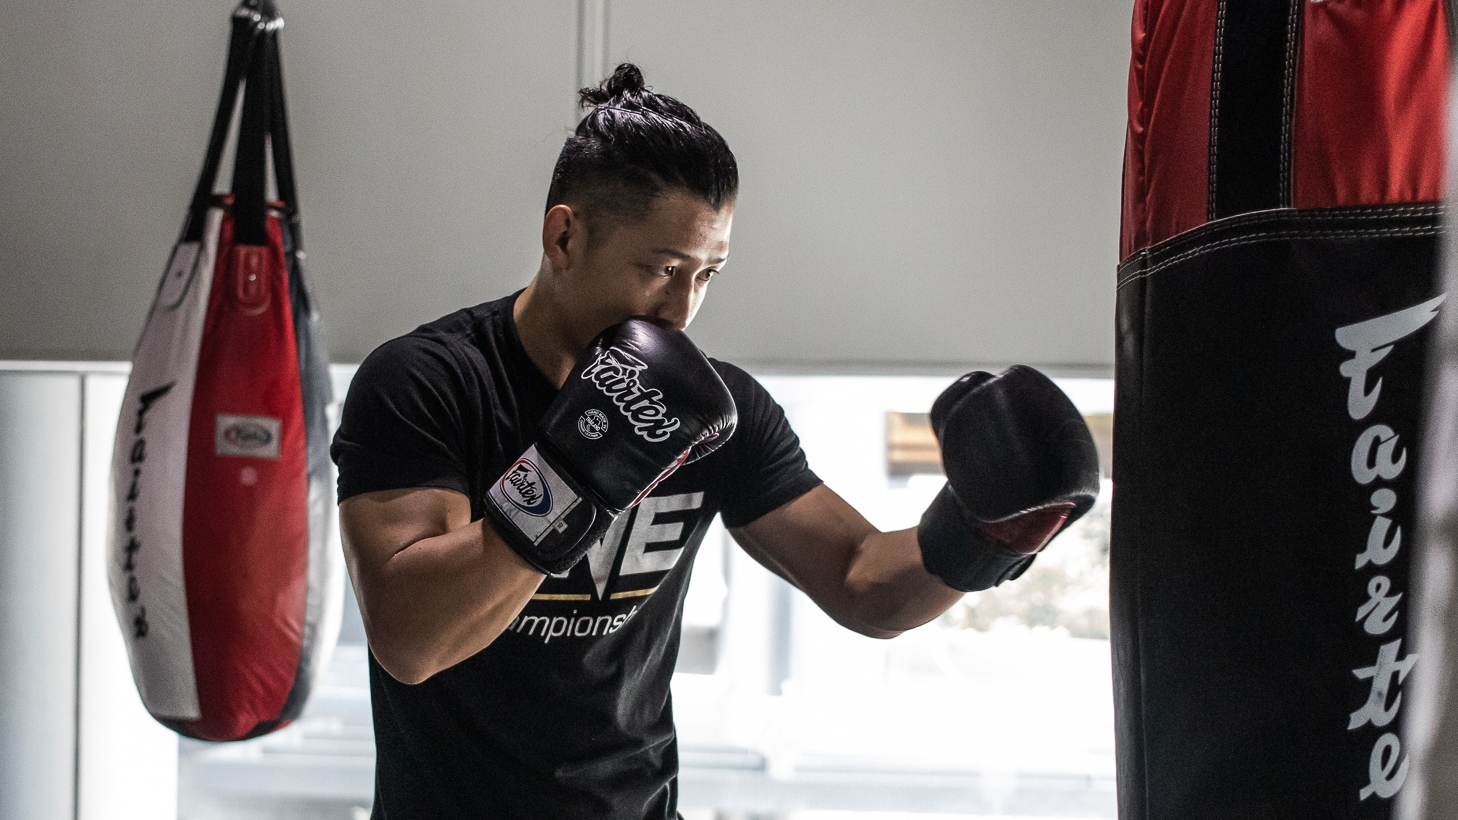 hiroki boxing